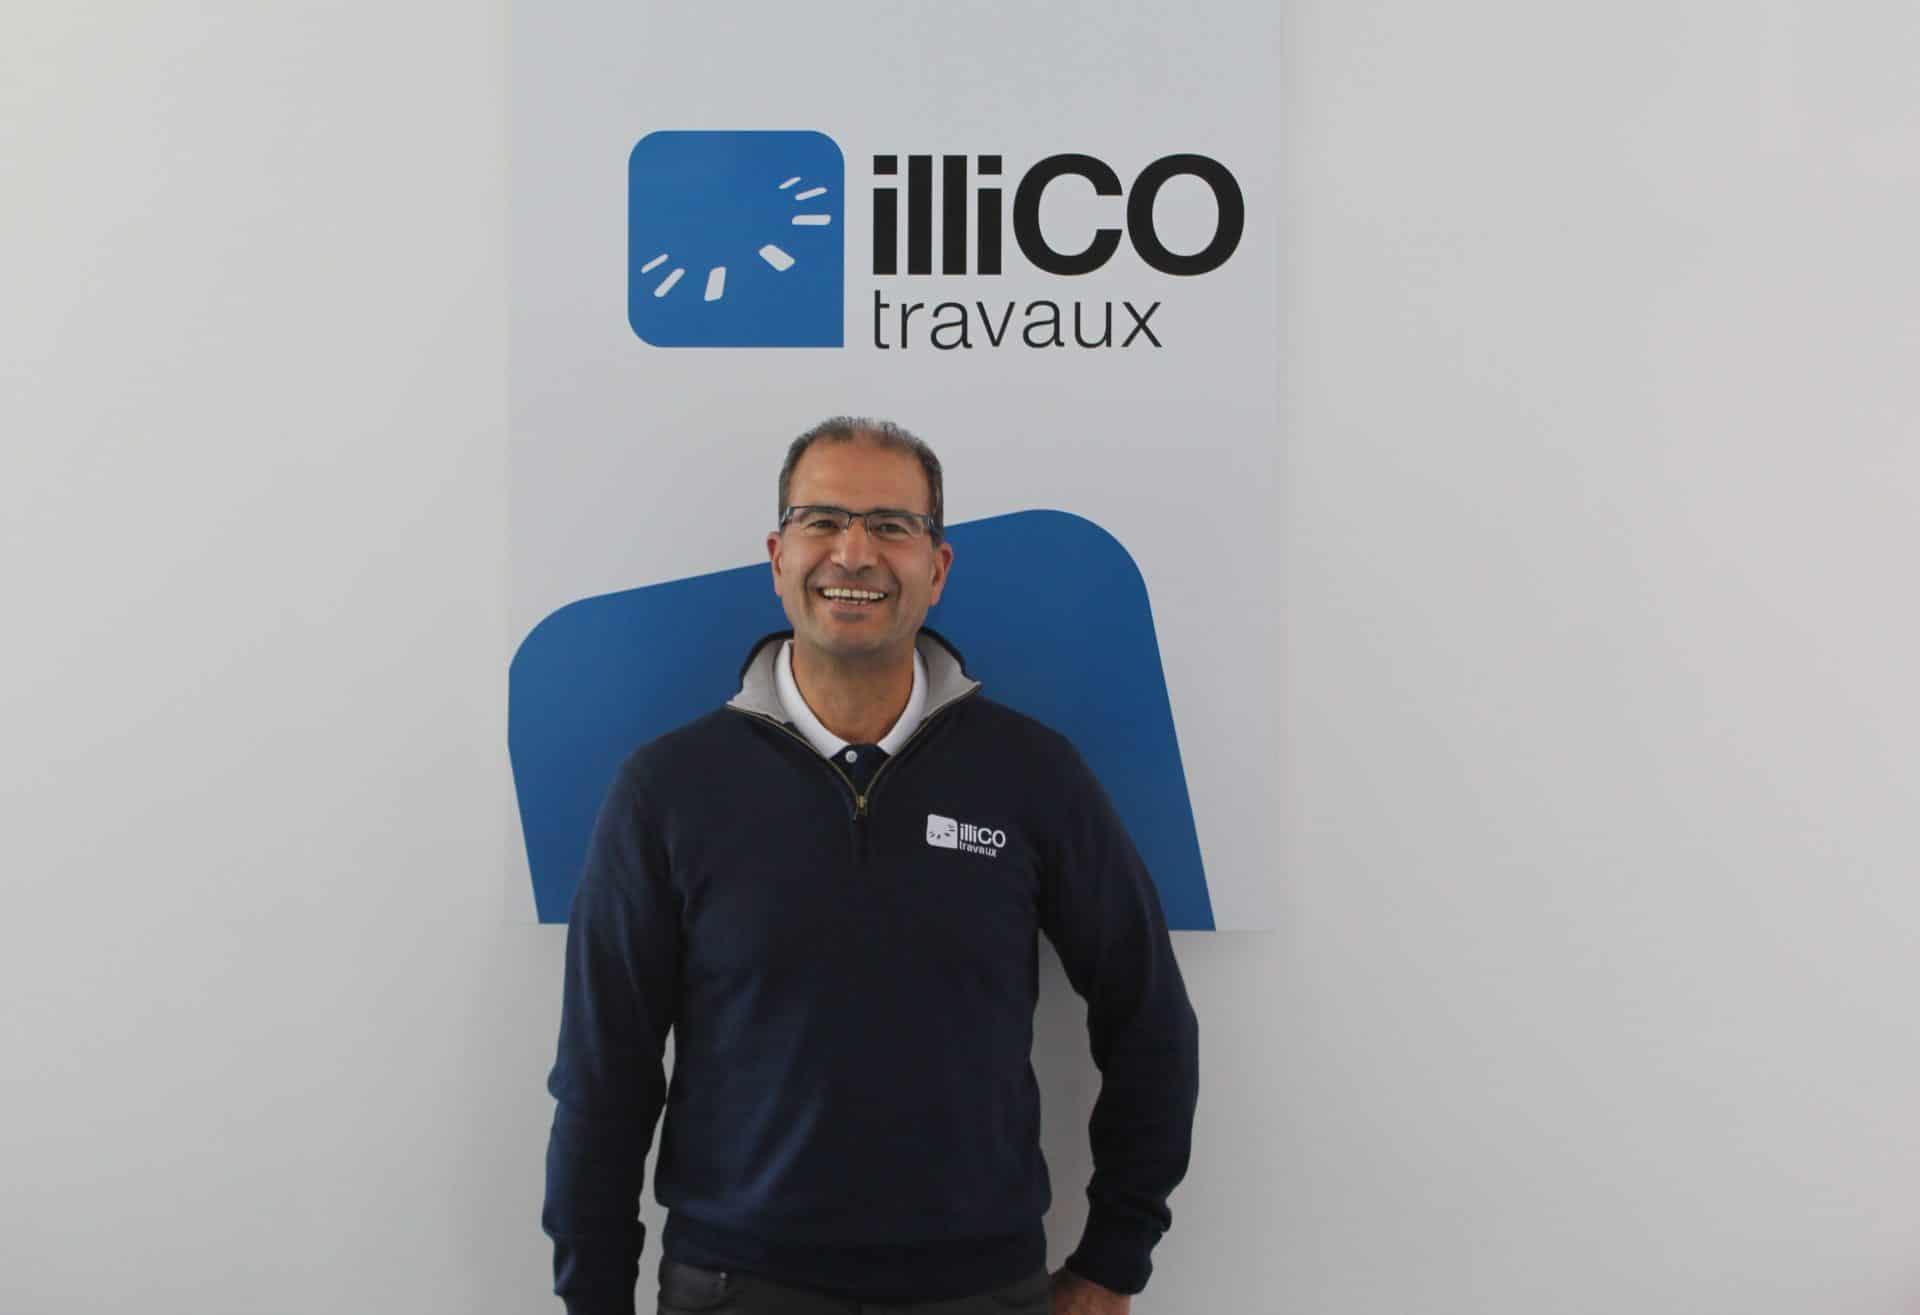 illiCO travaux Besançon